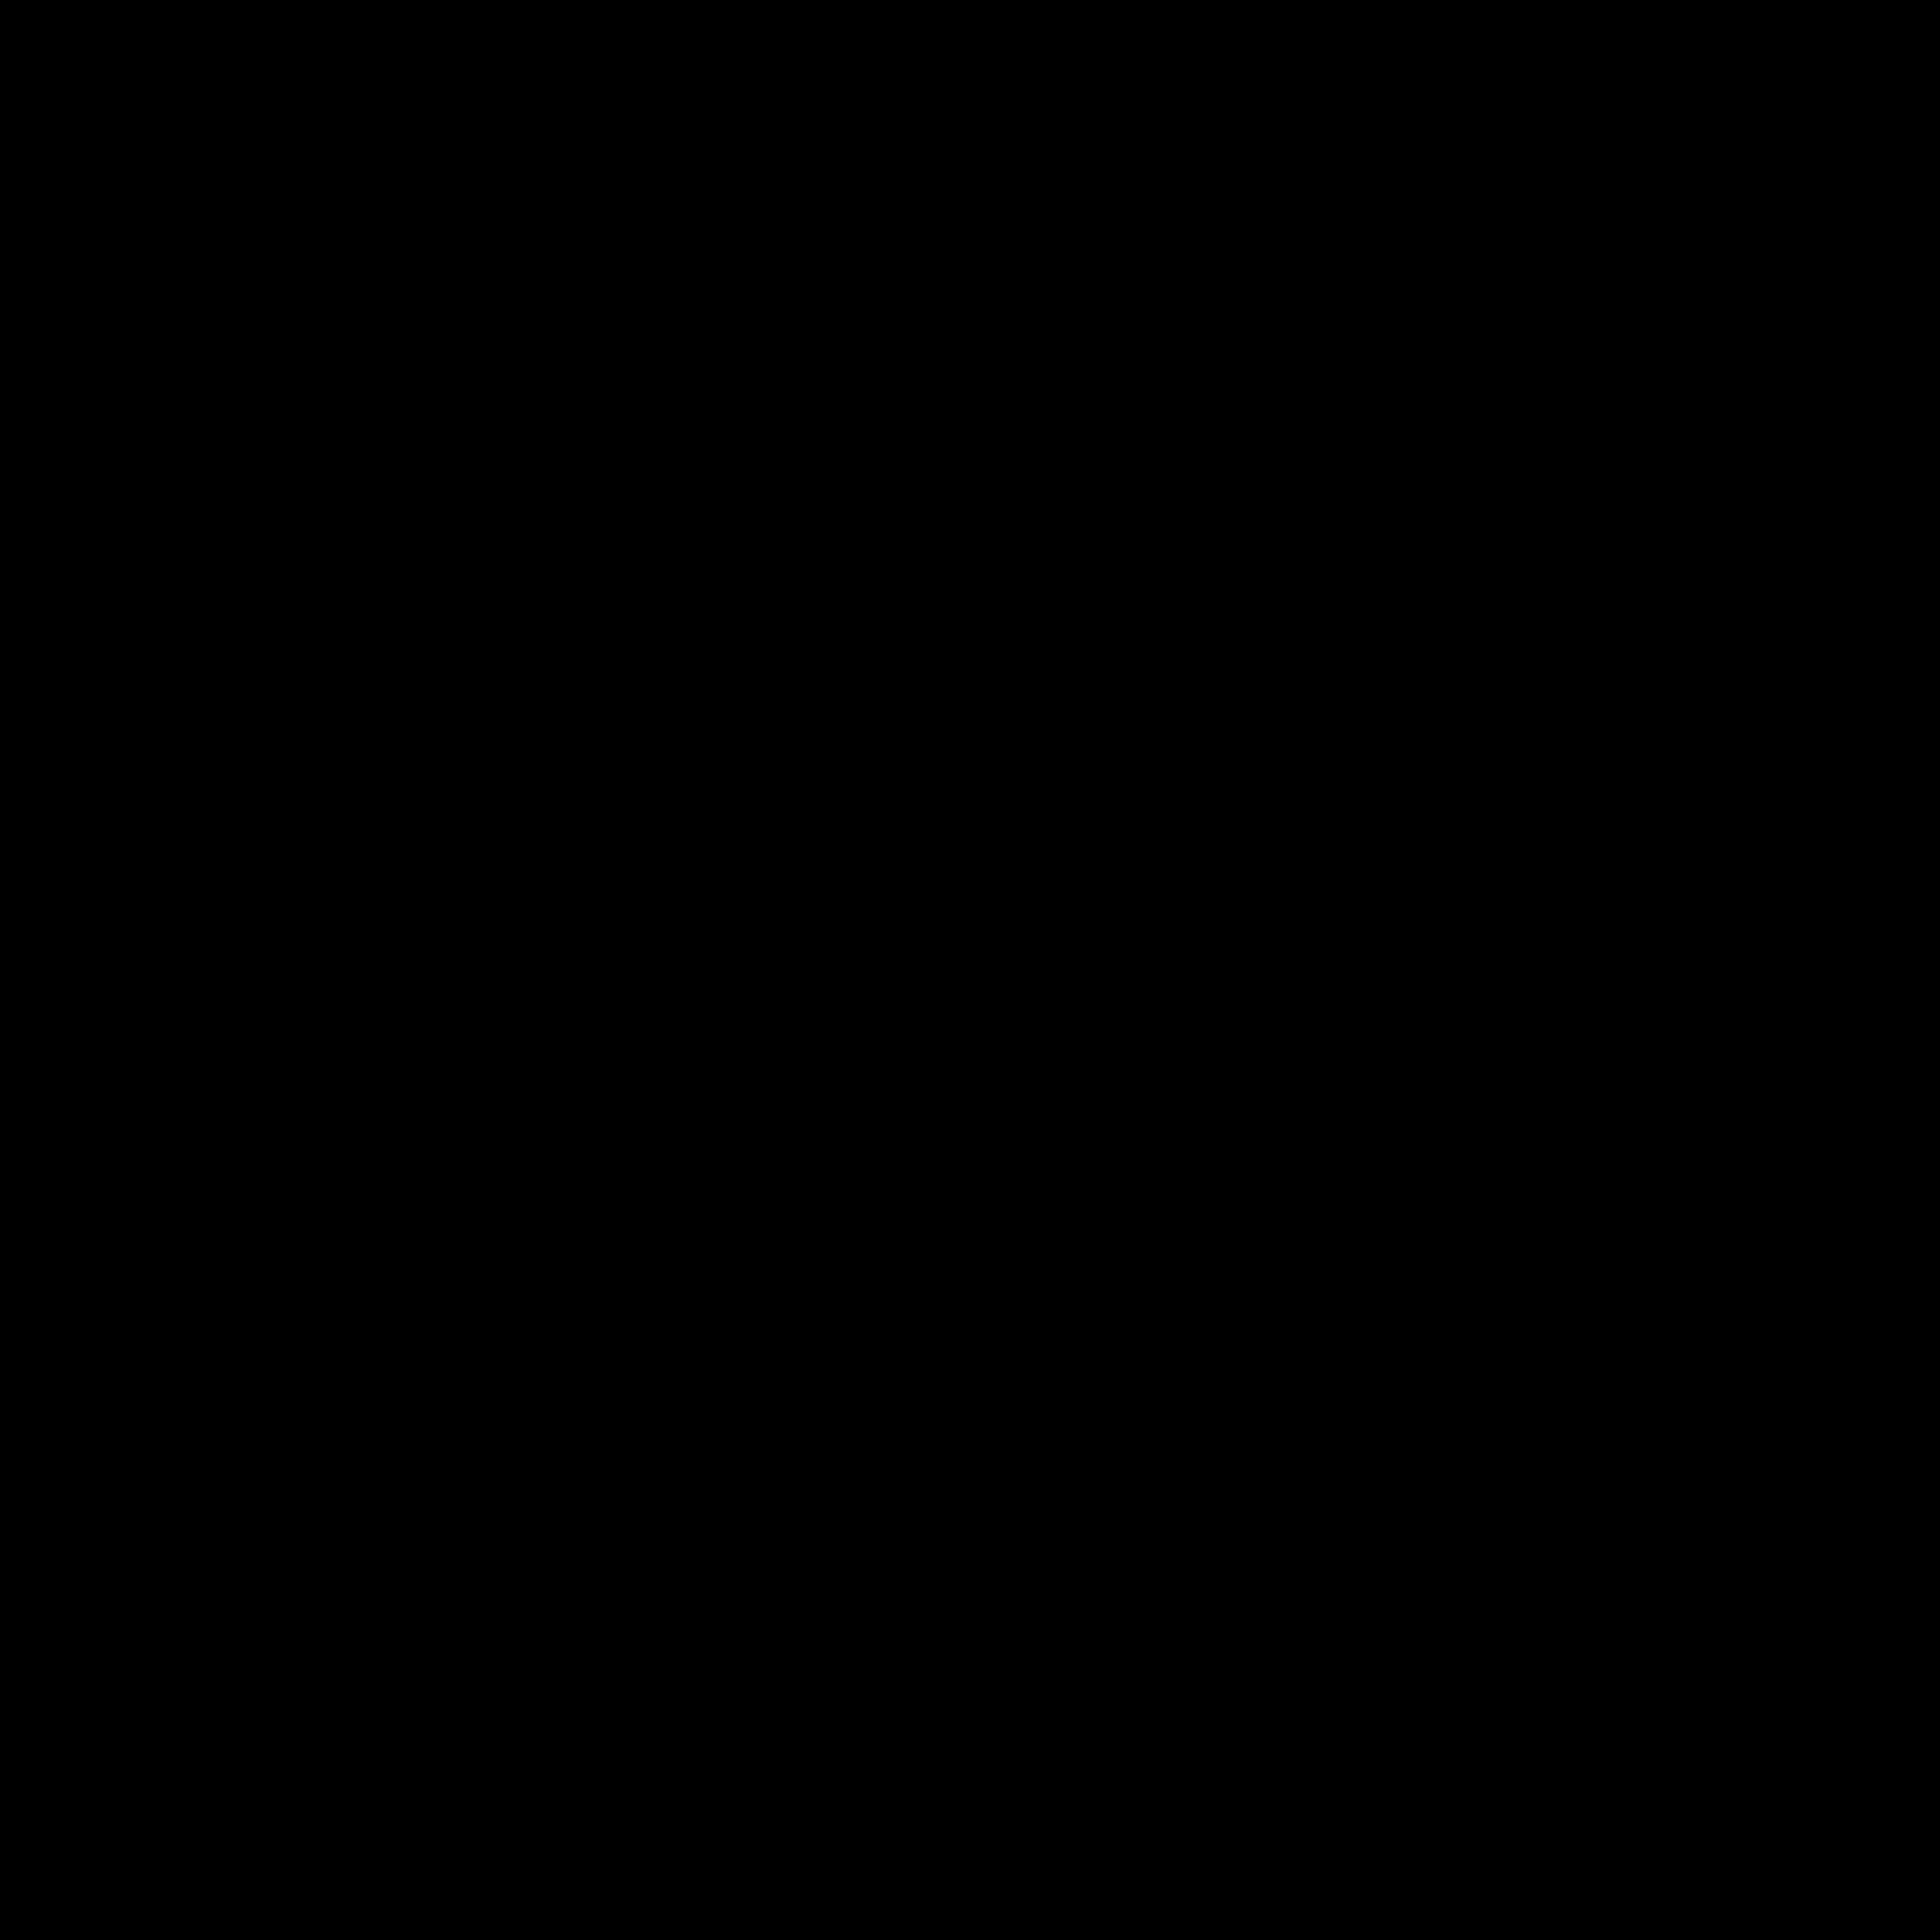 Circular frame png. Abstract line art icons